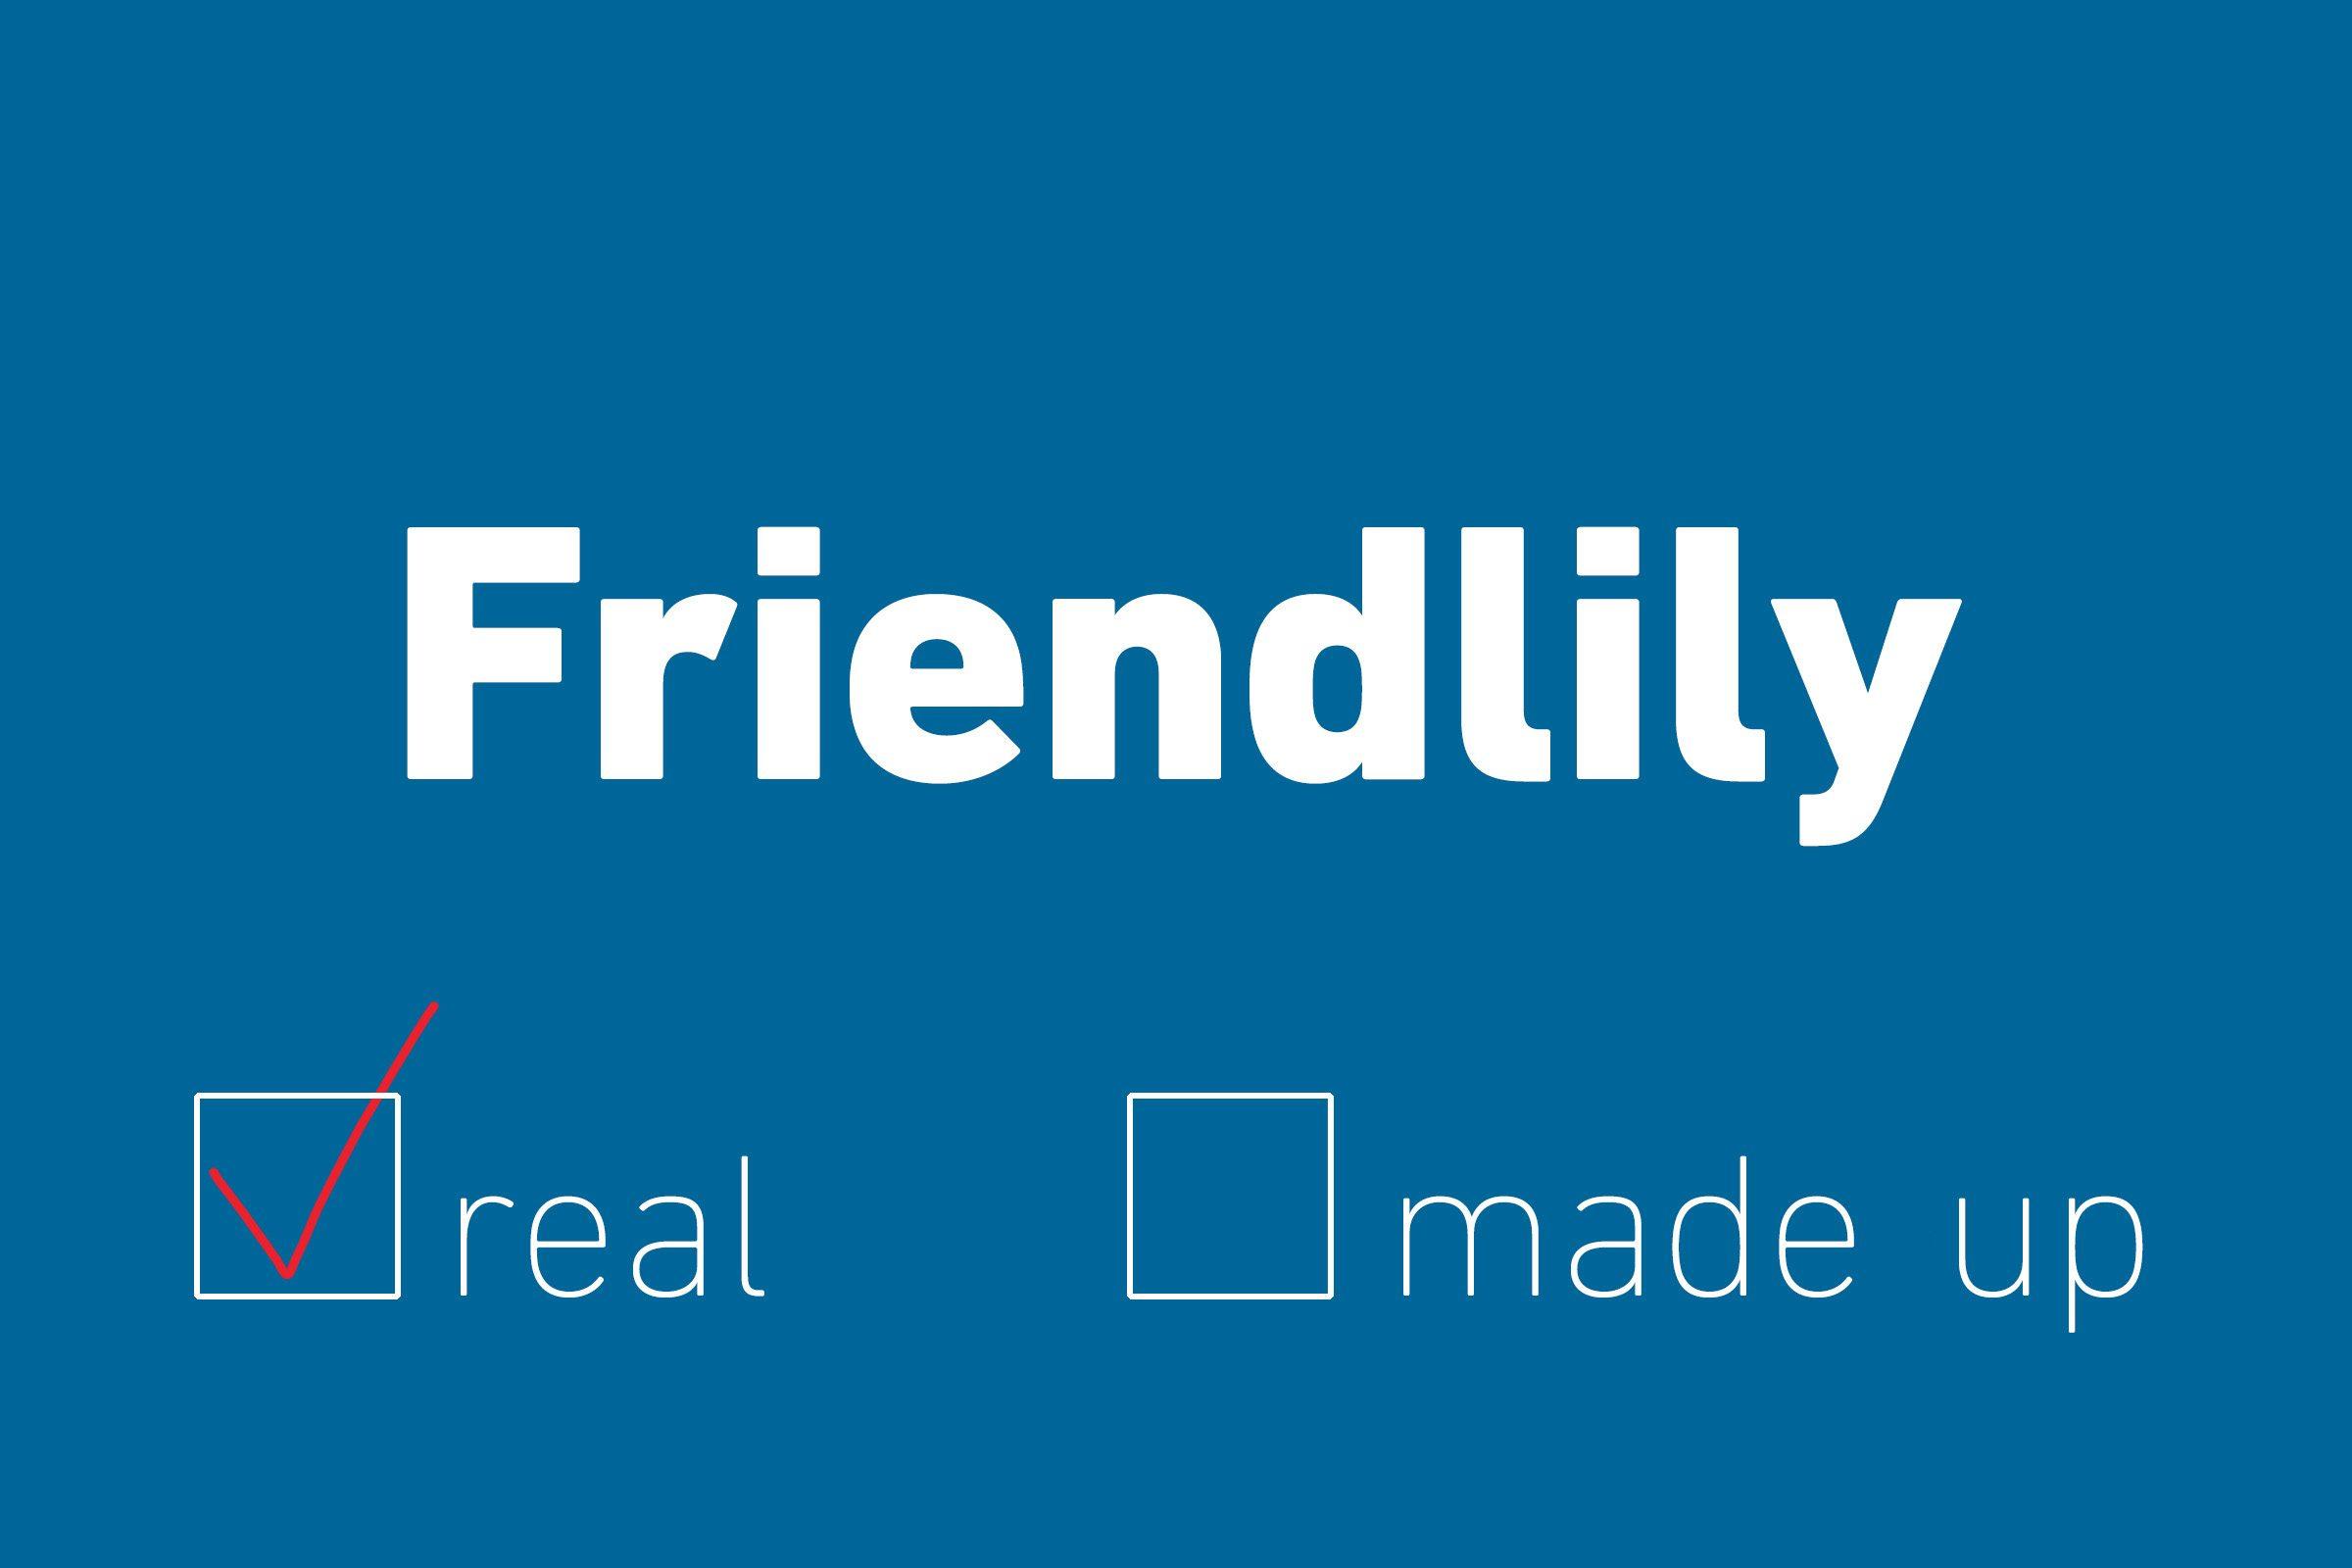 friendlily real